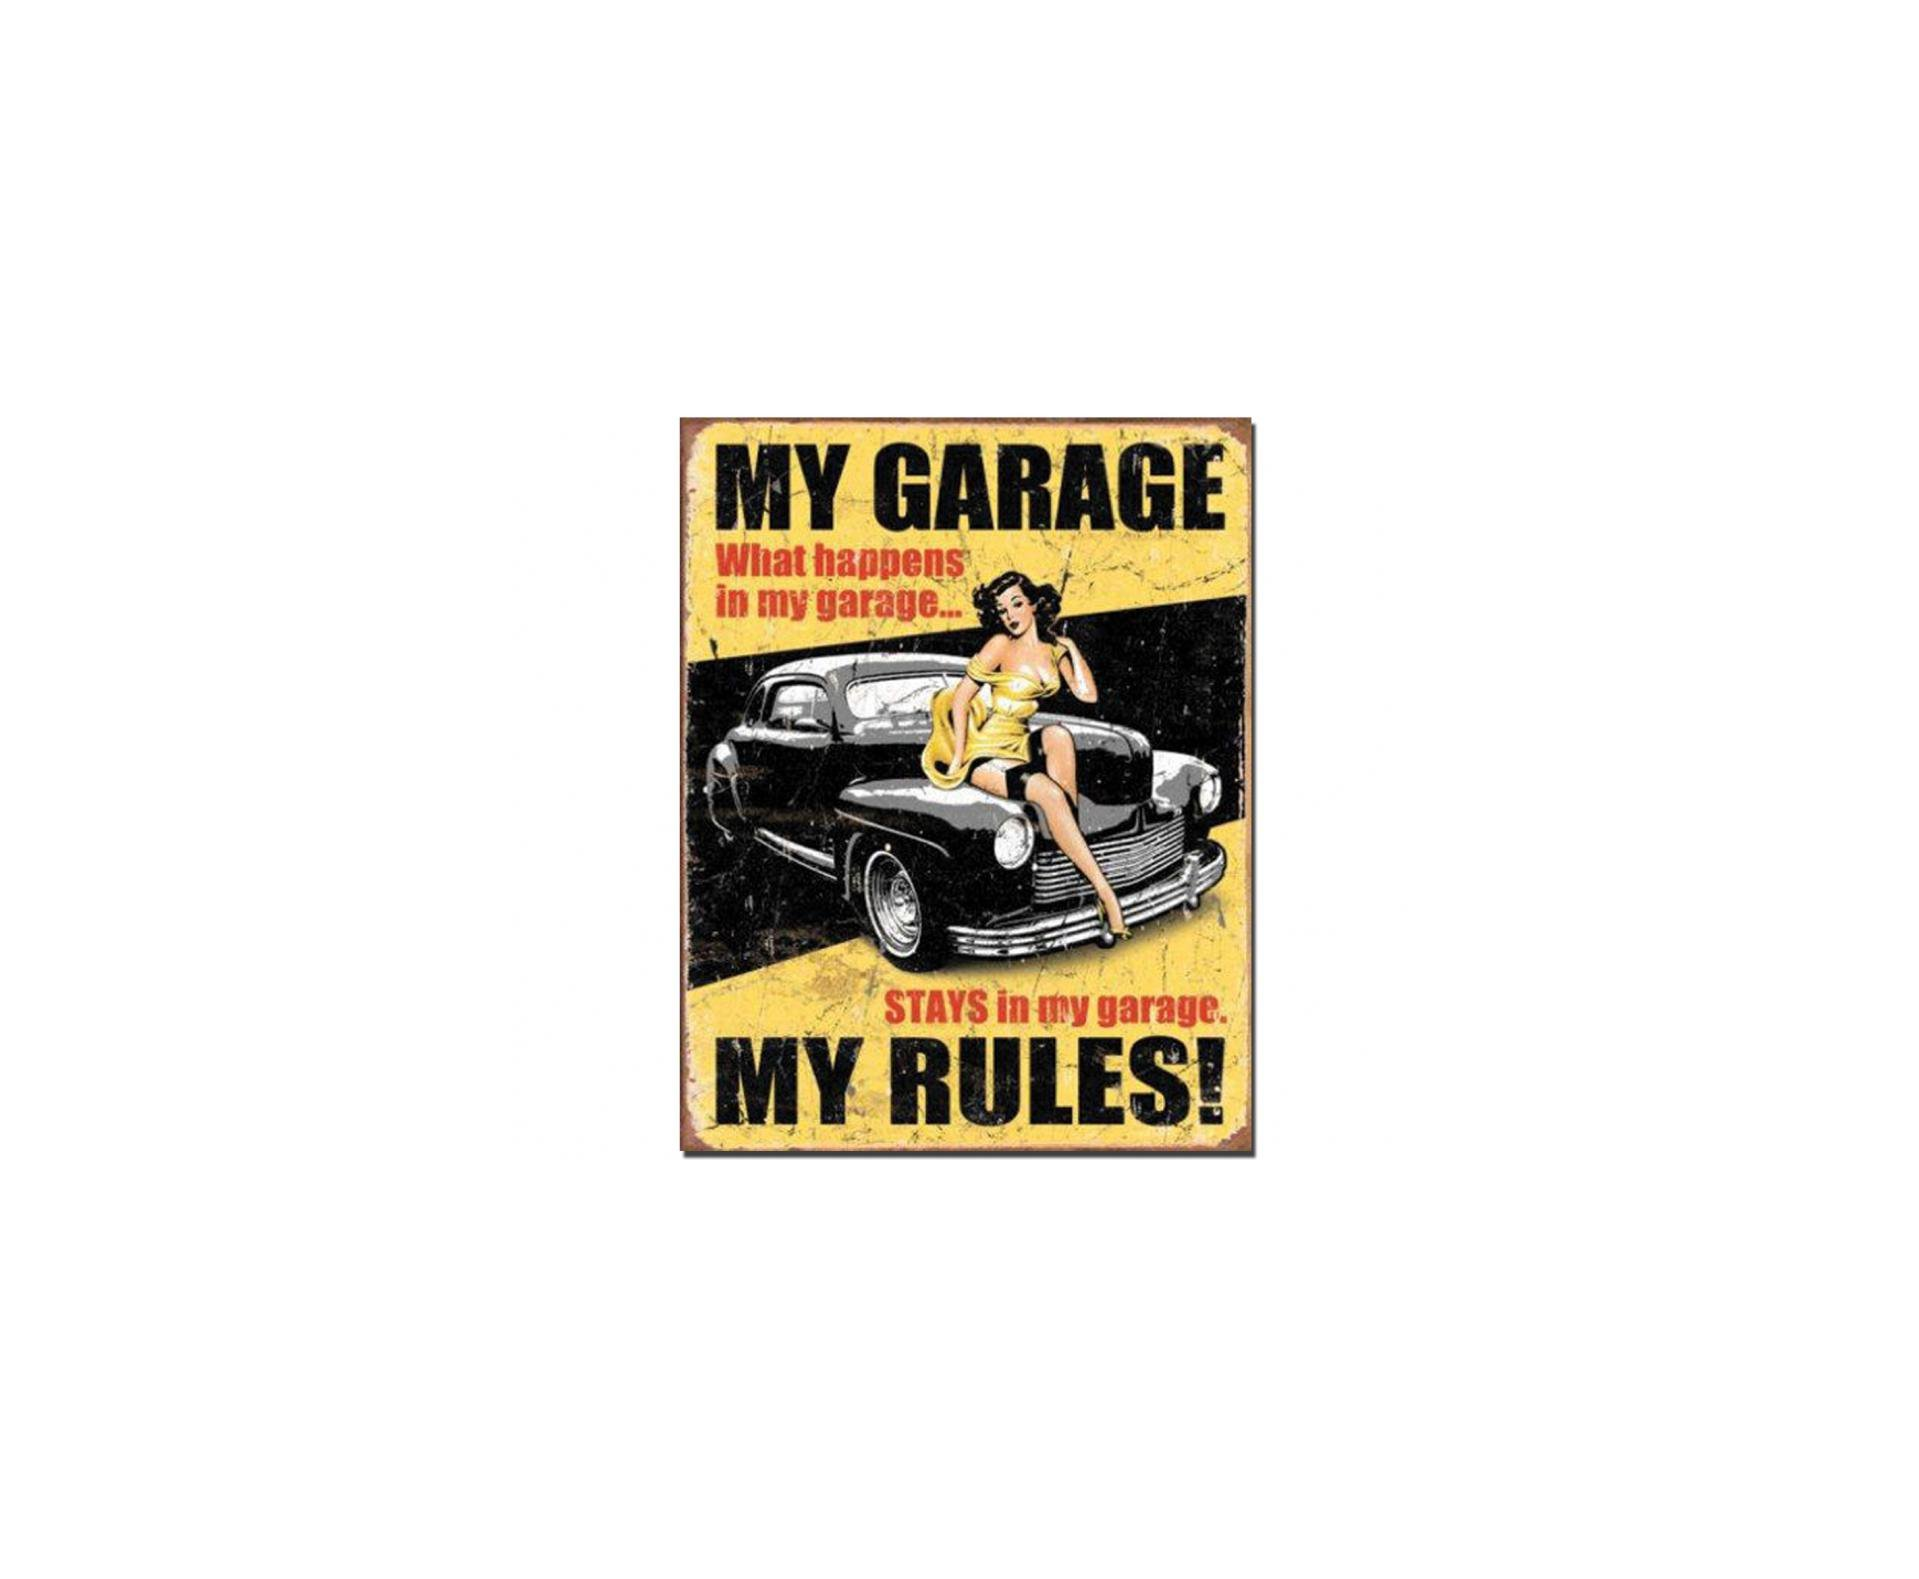 Placa Metálica Decorativa Legends My Garage - Rossi